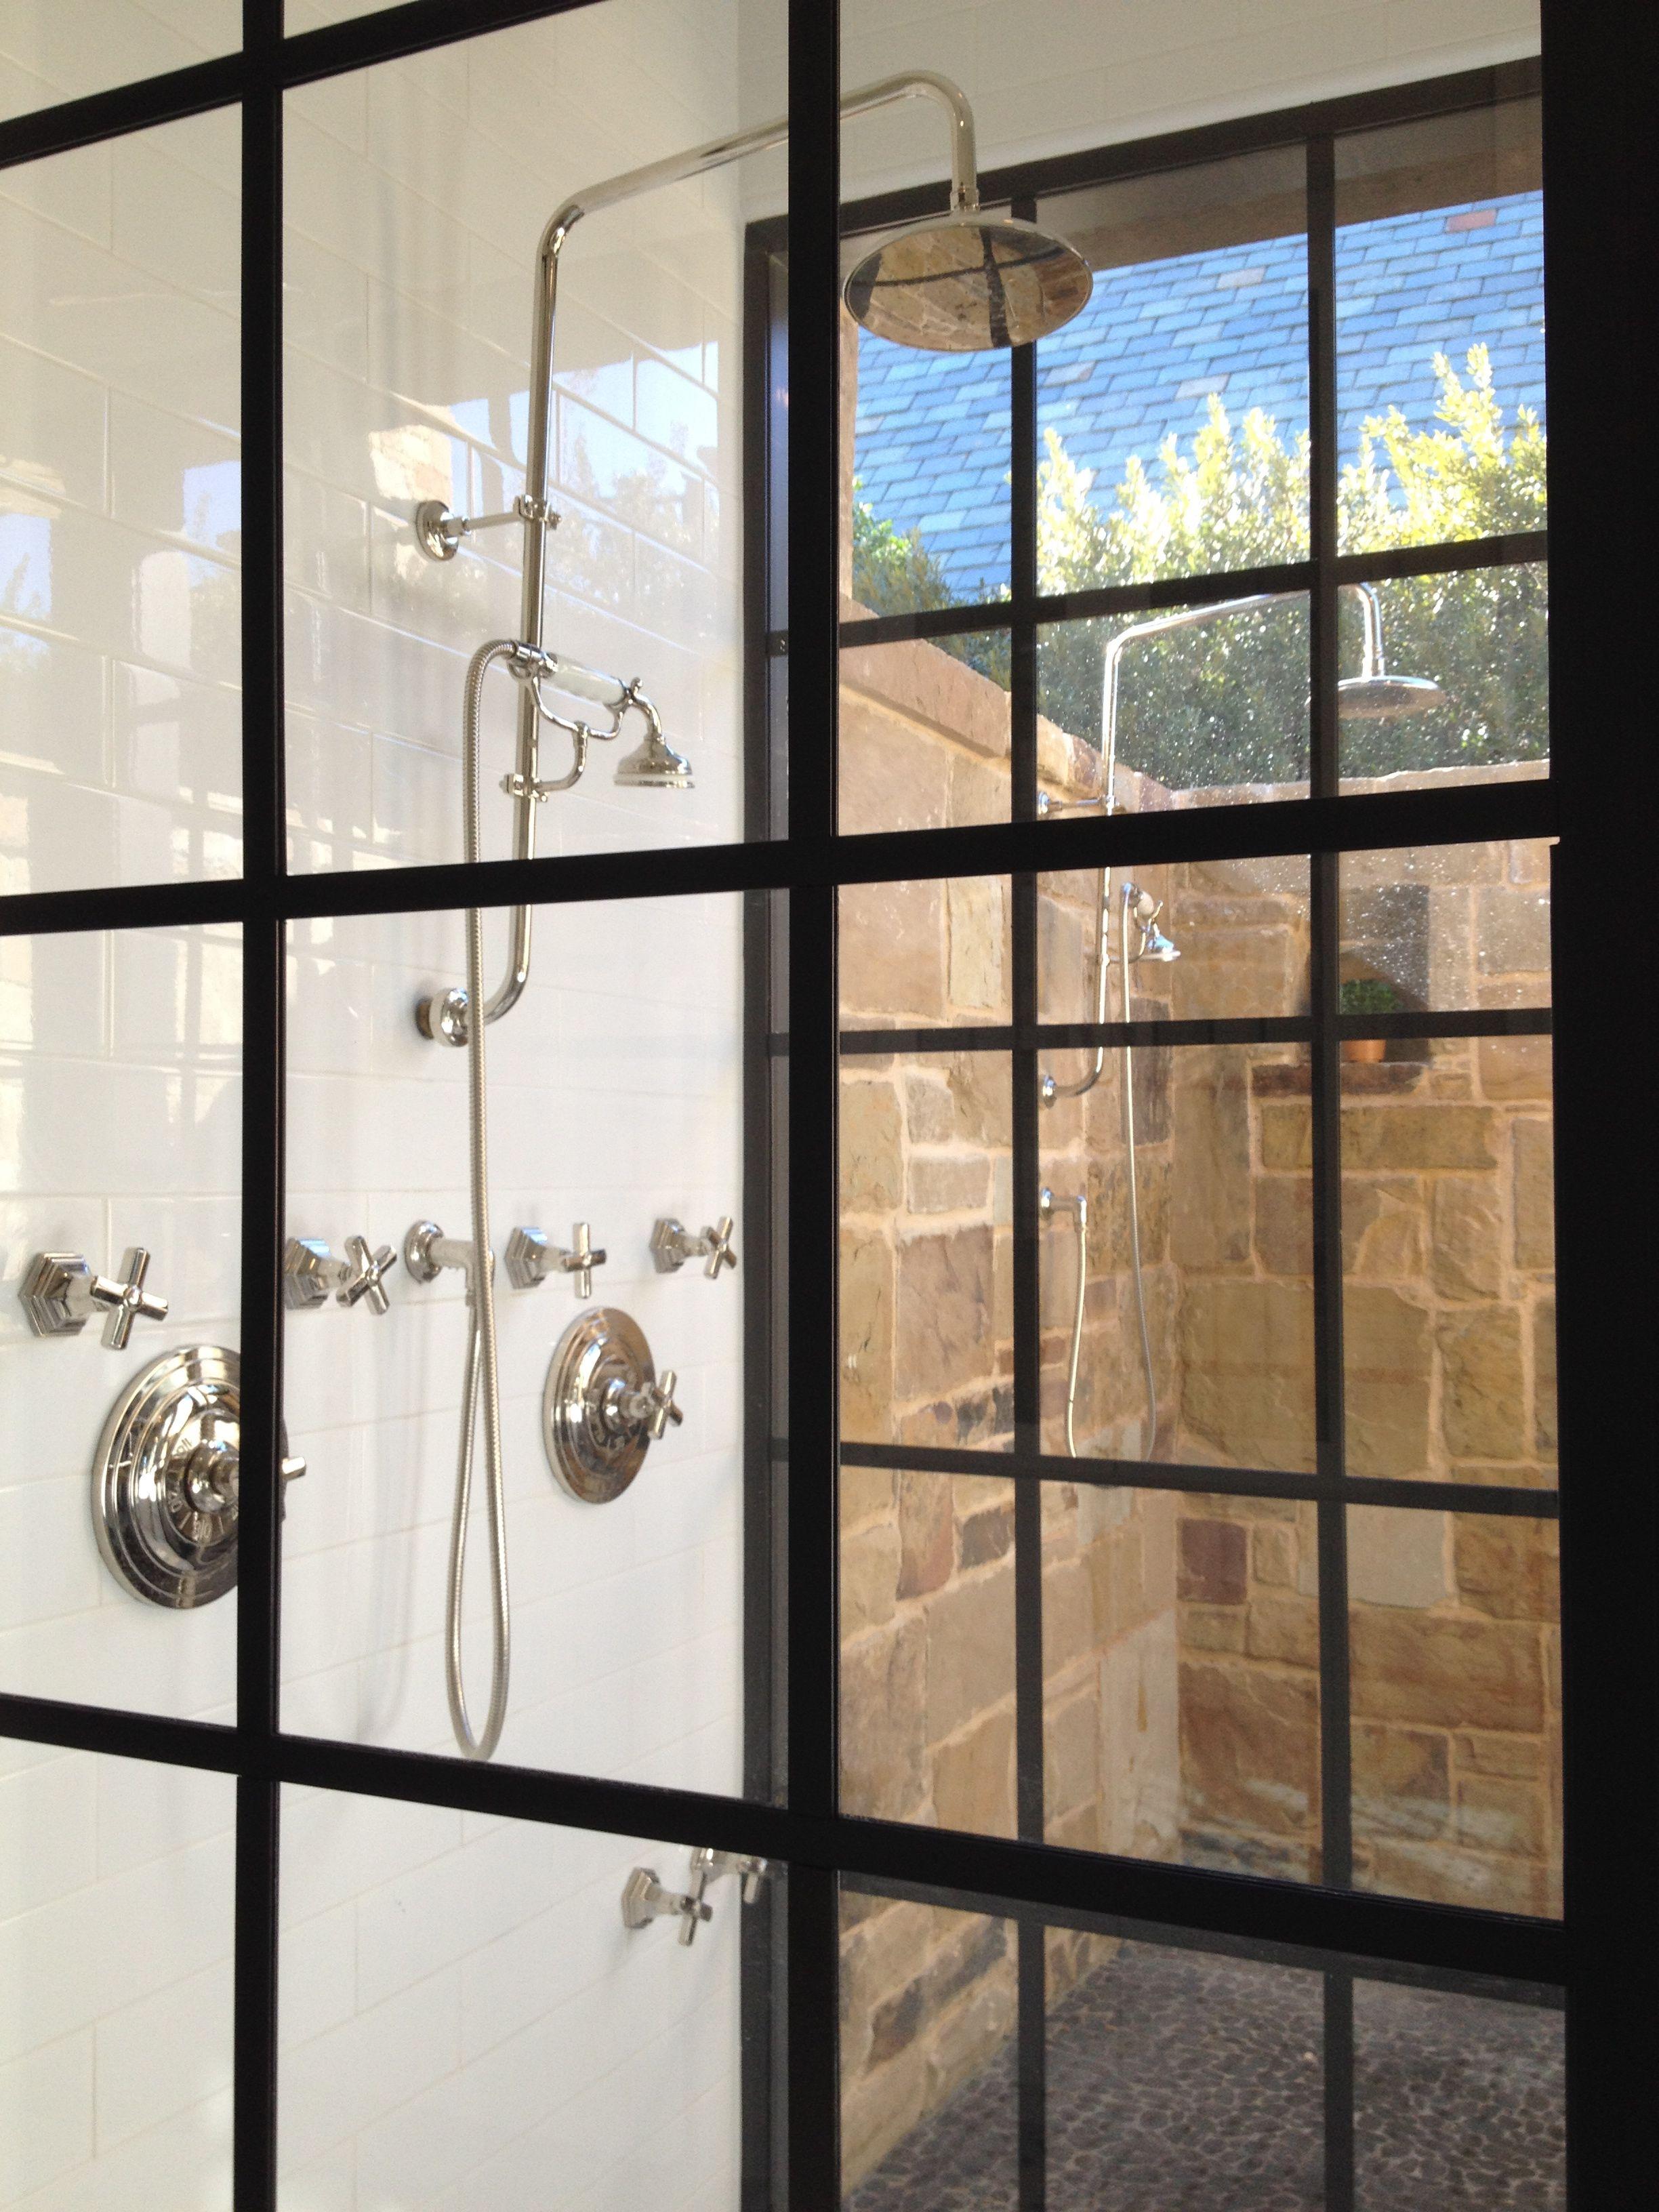 Indoor Outdoor Shower Designer Maryspangler Yahoo Com Dallas